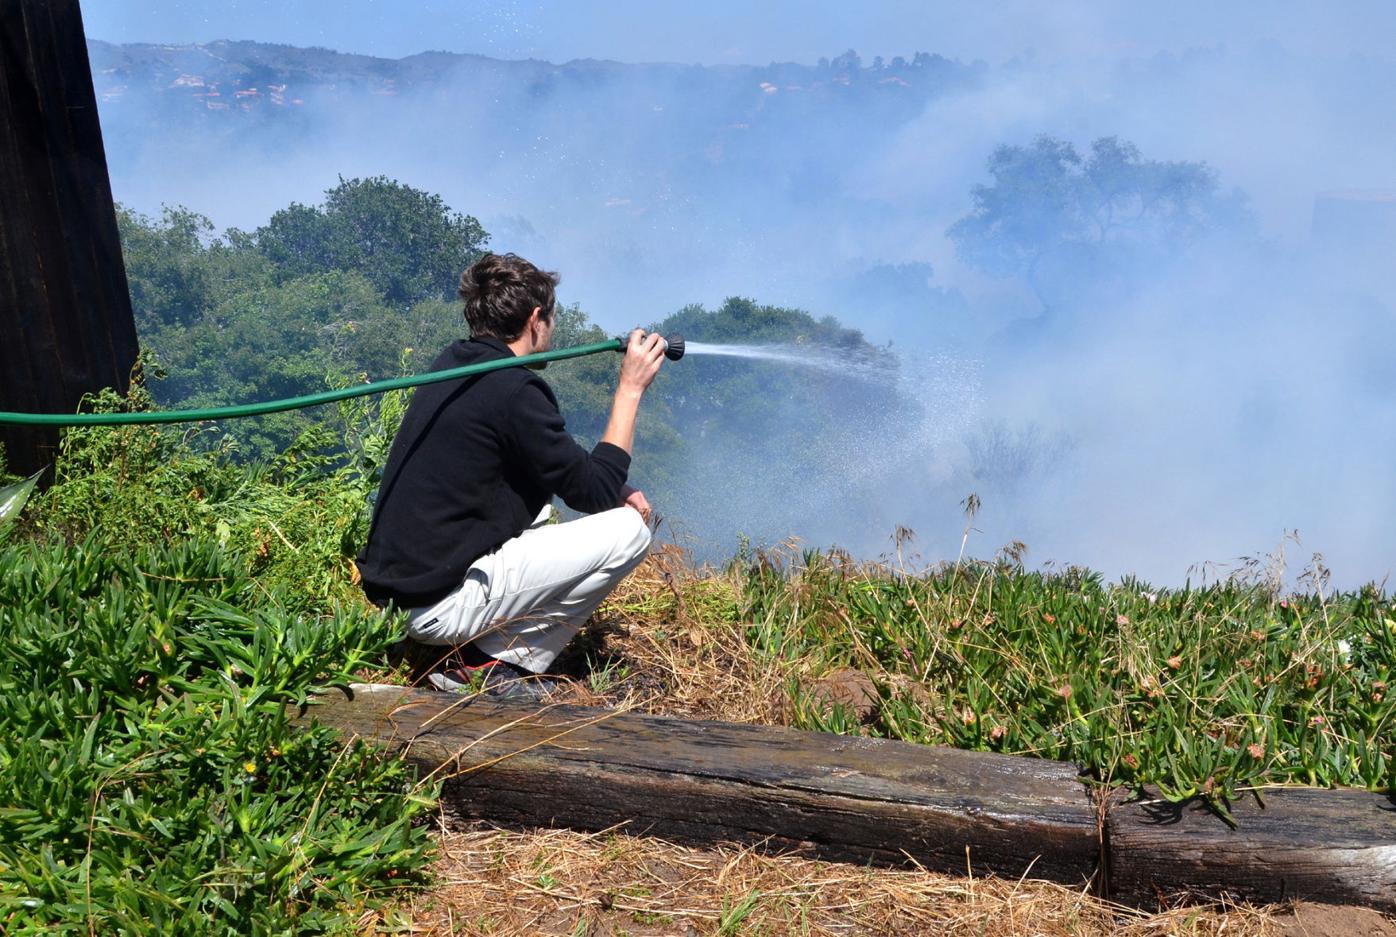 042416 Vandenberg Village Brush Fire 04.jpg